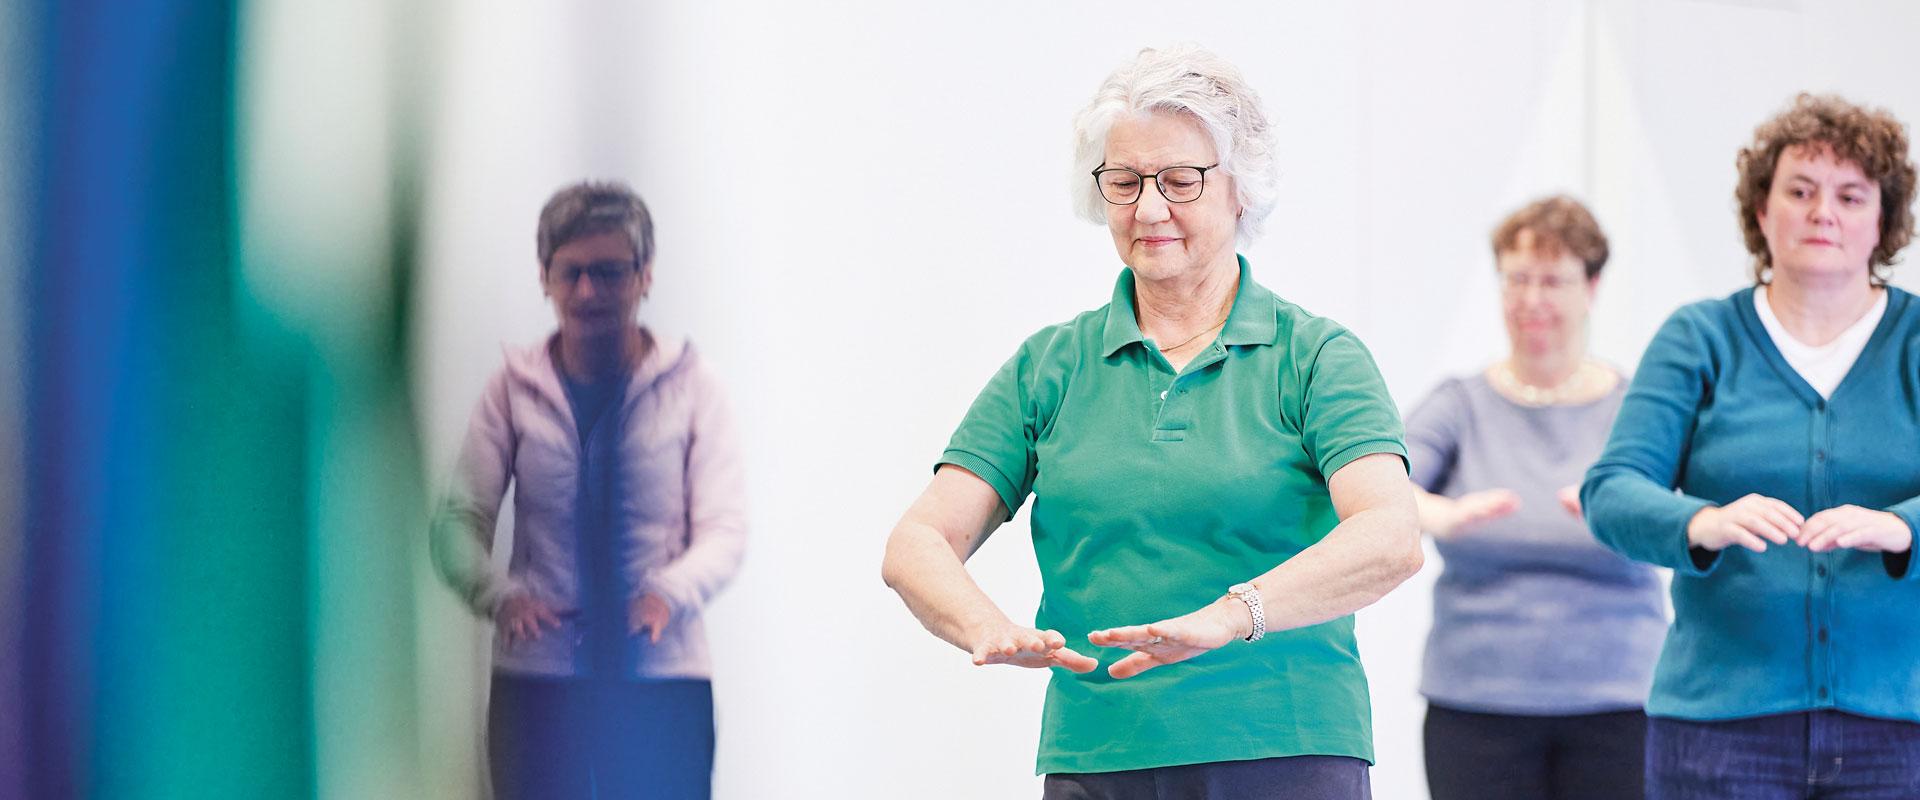 Tai-Chi Gesundheit Aufbaukurs